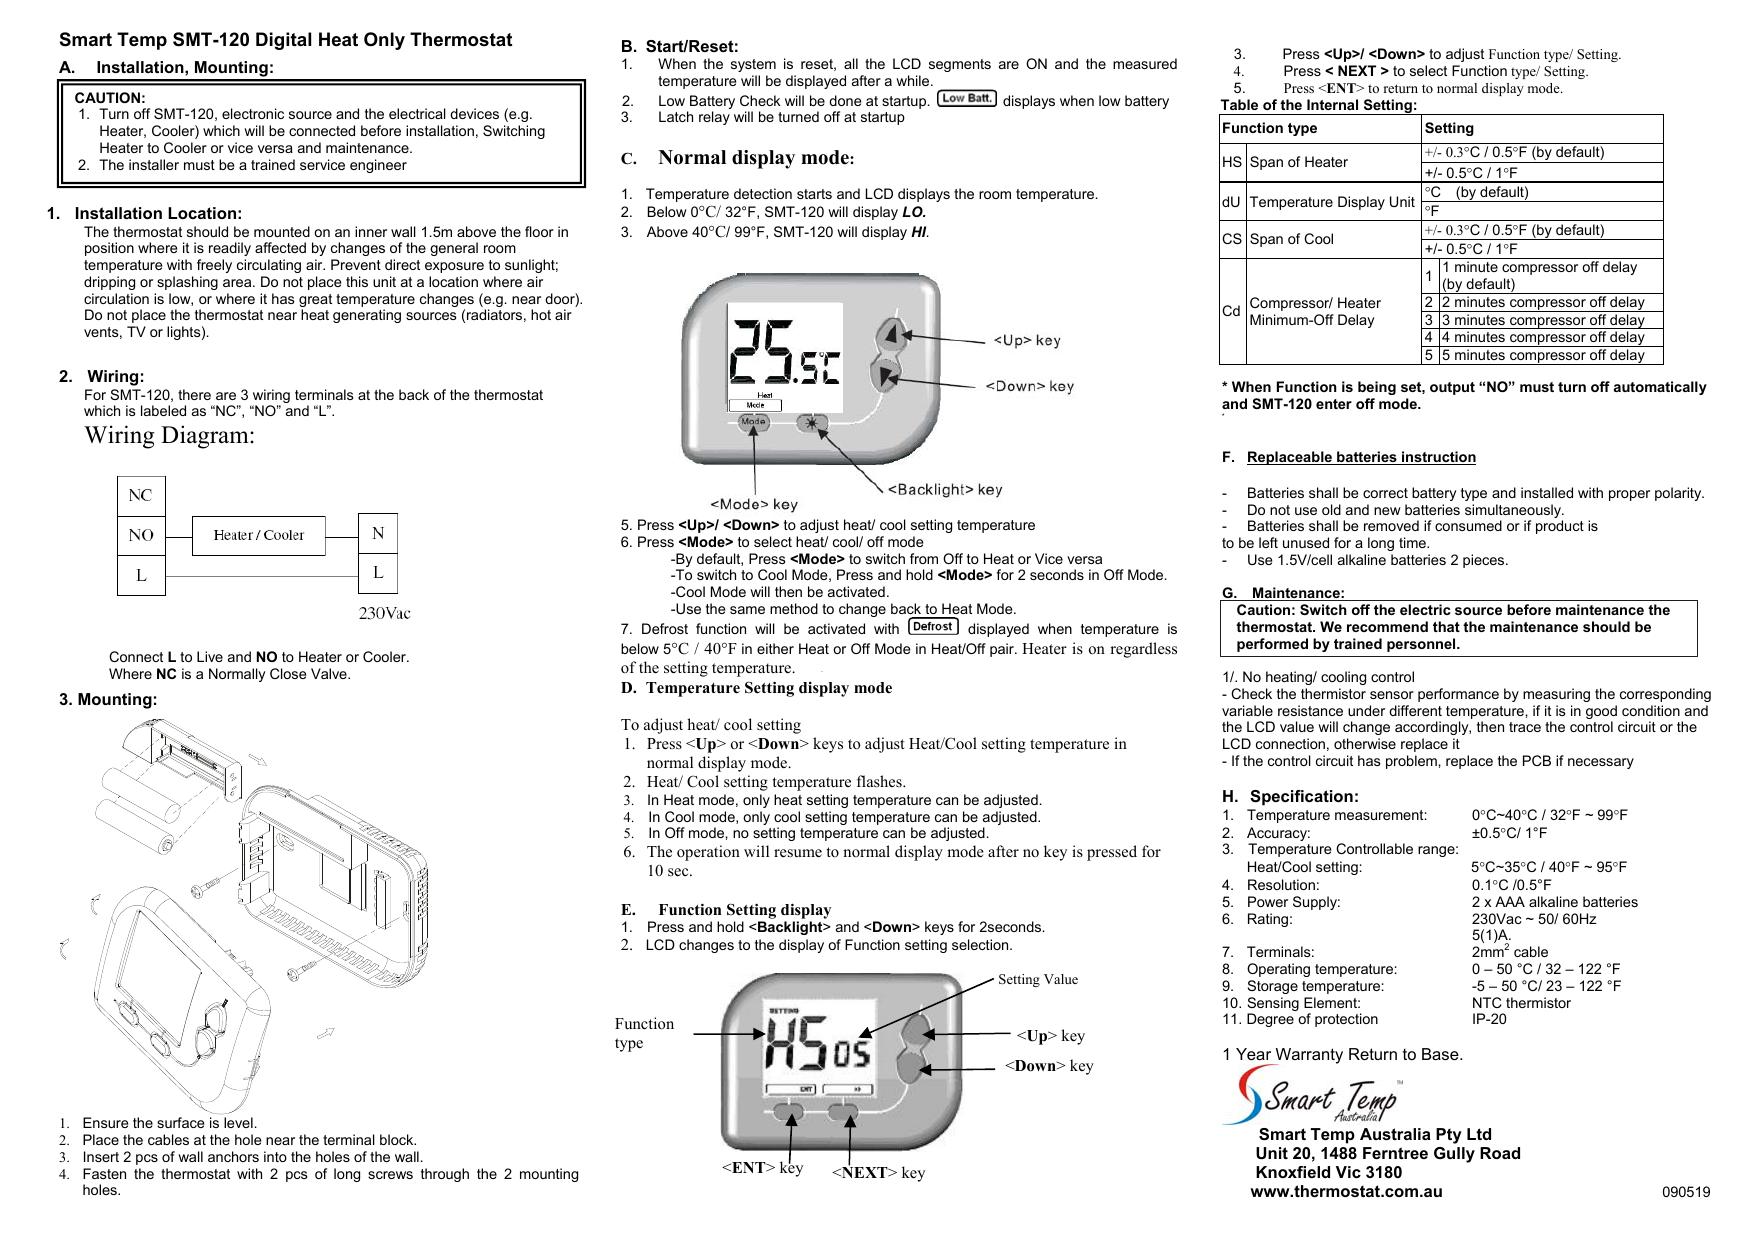 Wiring Diagram - Smart Temp Australia   Manualzzmanualzz